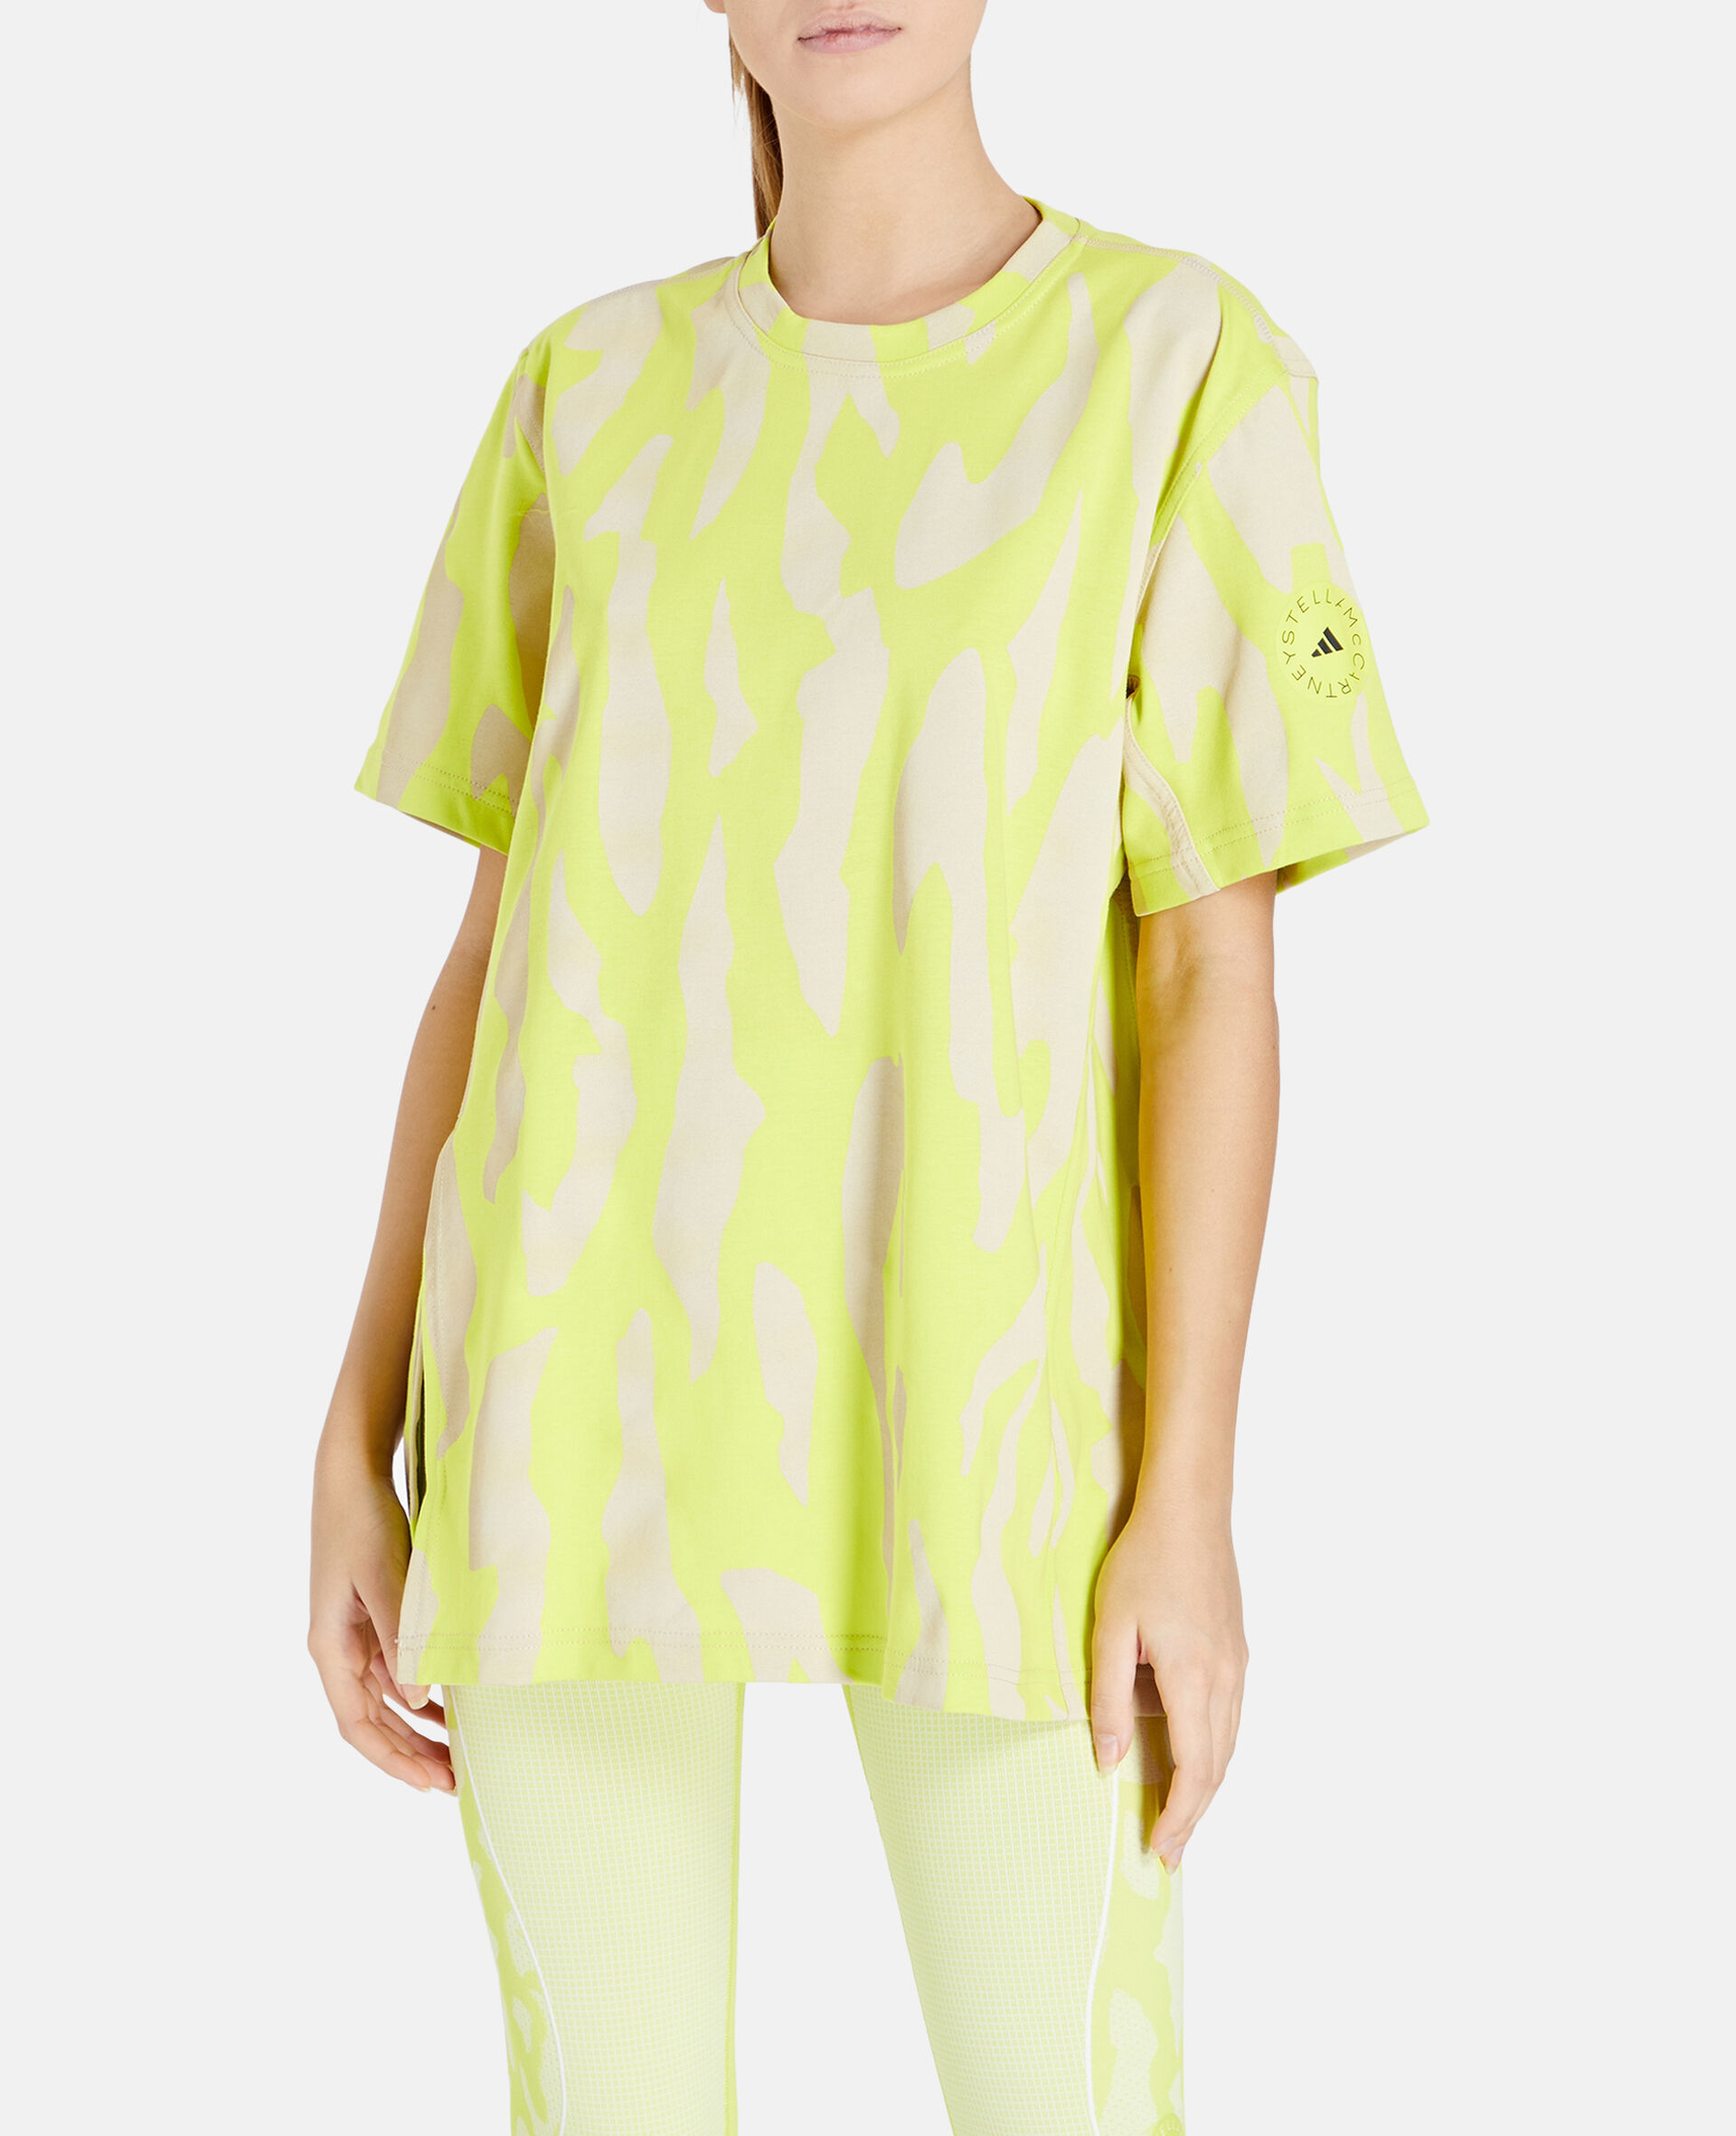 Future Playground T-Shirt-Yellow-large image number 4